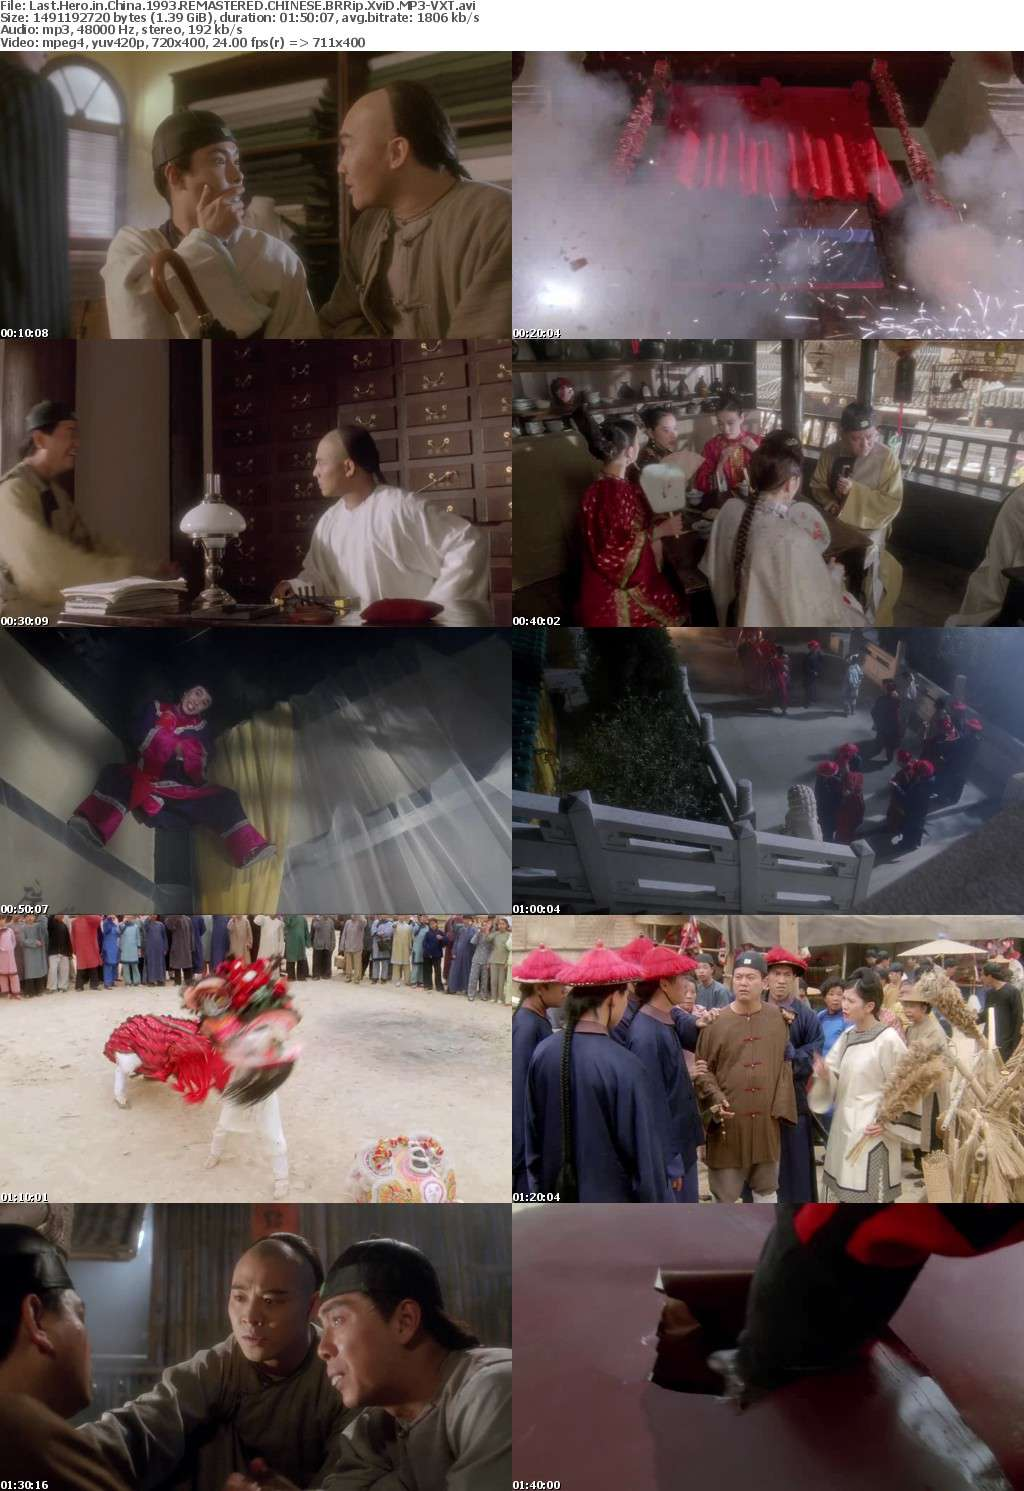 Last Hero in China 1993 REMASTERED CHINESE BRRip XviD MP3-VXT